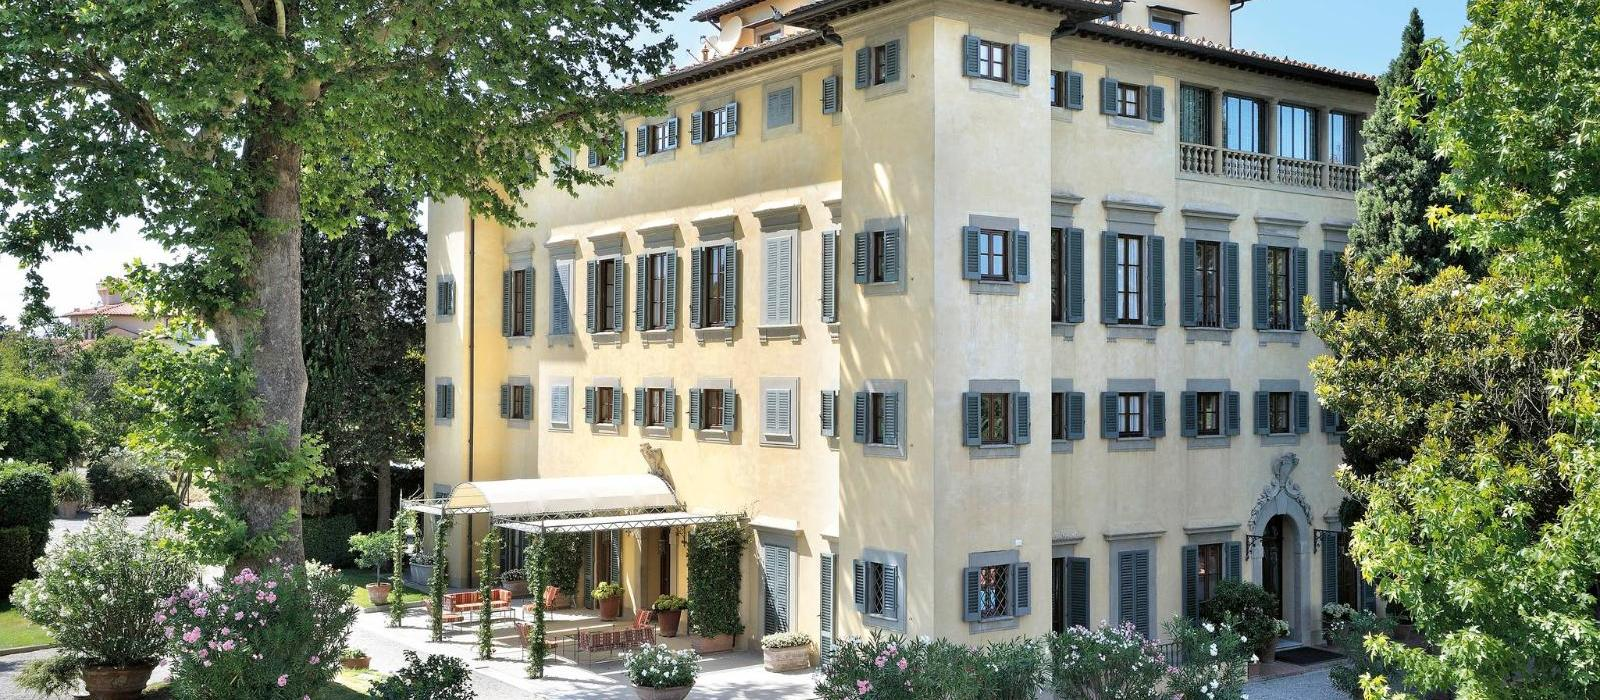 拉马萨别墅酒店(Villa la Massa) 图片  www.lhw.cn